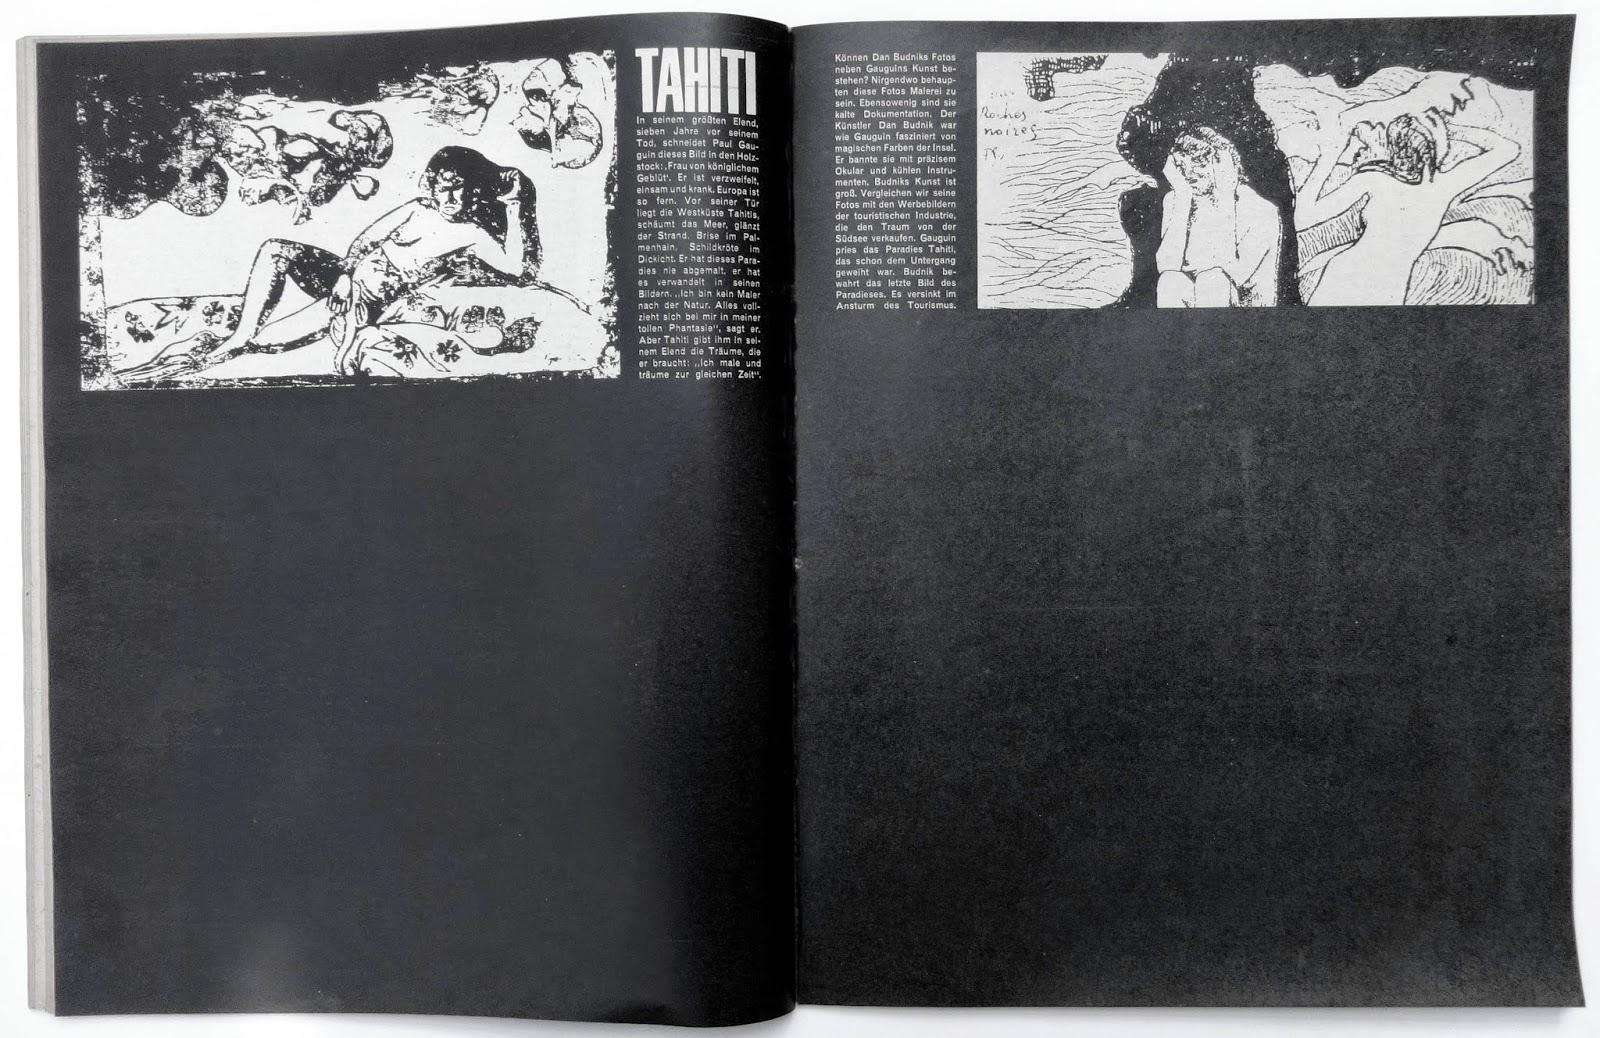 1974 marilyn monroe datebook dating 8